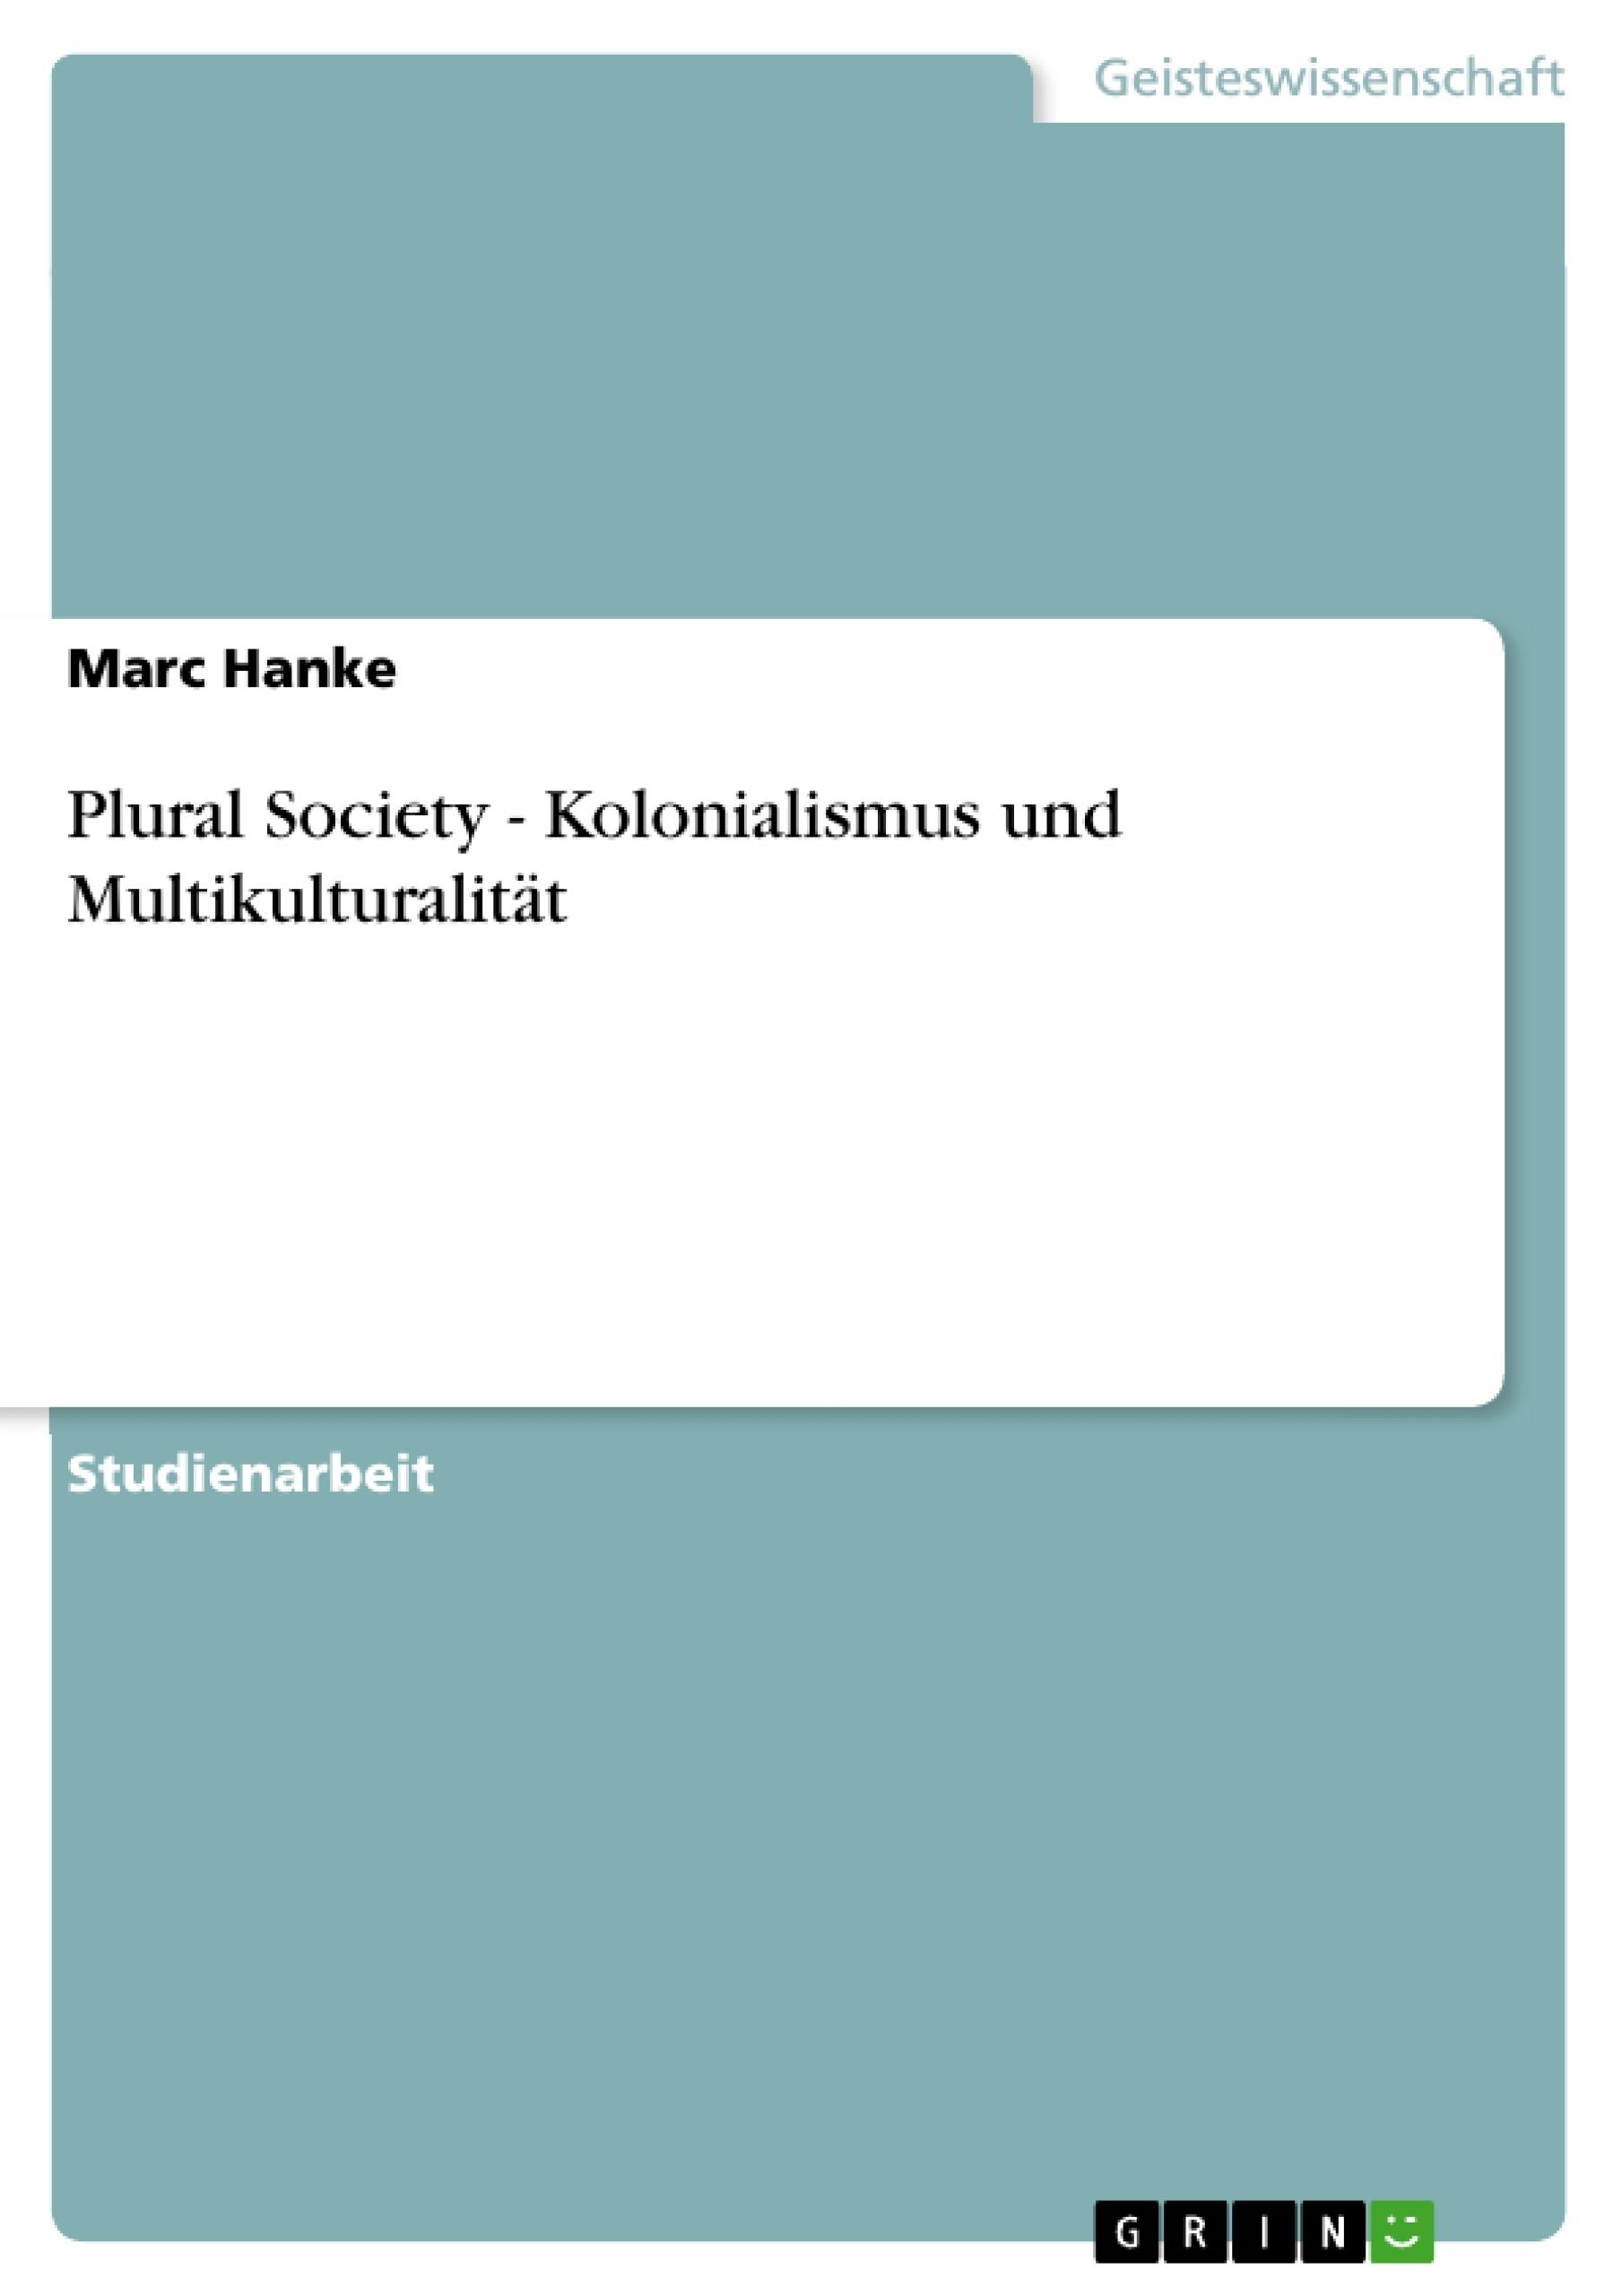 Titel: Plural Society - Kolonialismus und Multikulturalität